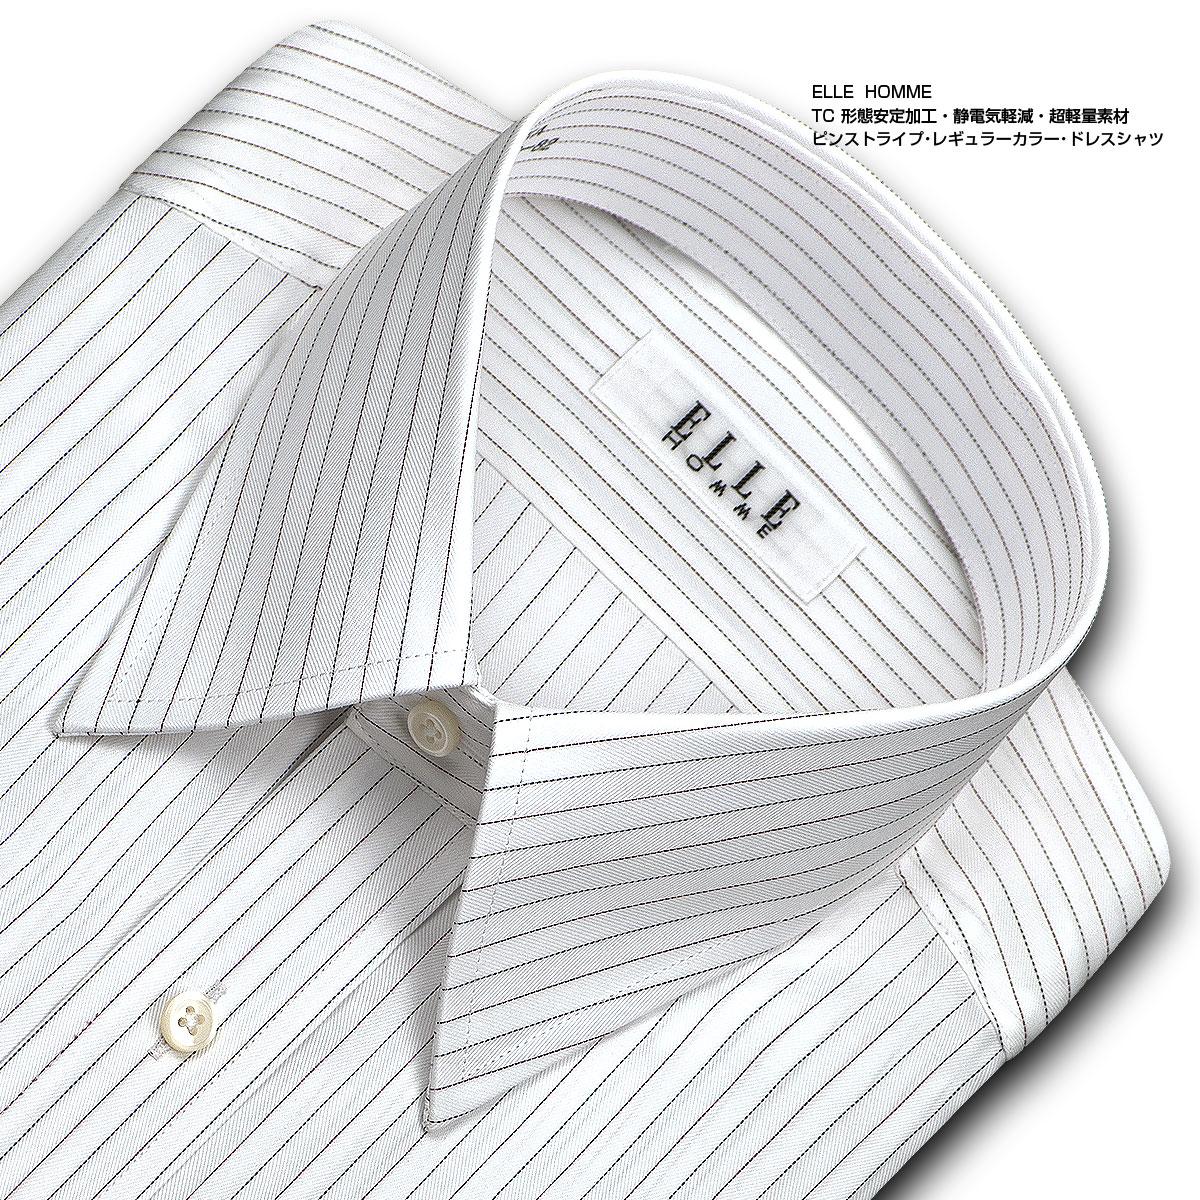 CHOYA SHIRT   Rakuten Global Market: ELLE HOMME shirt men four ...